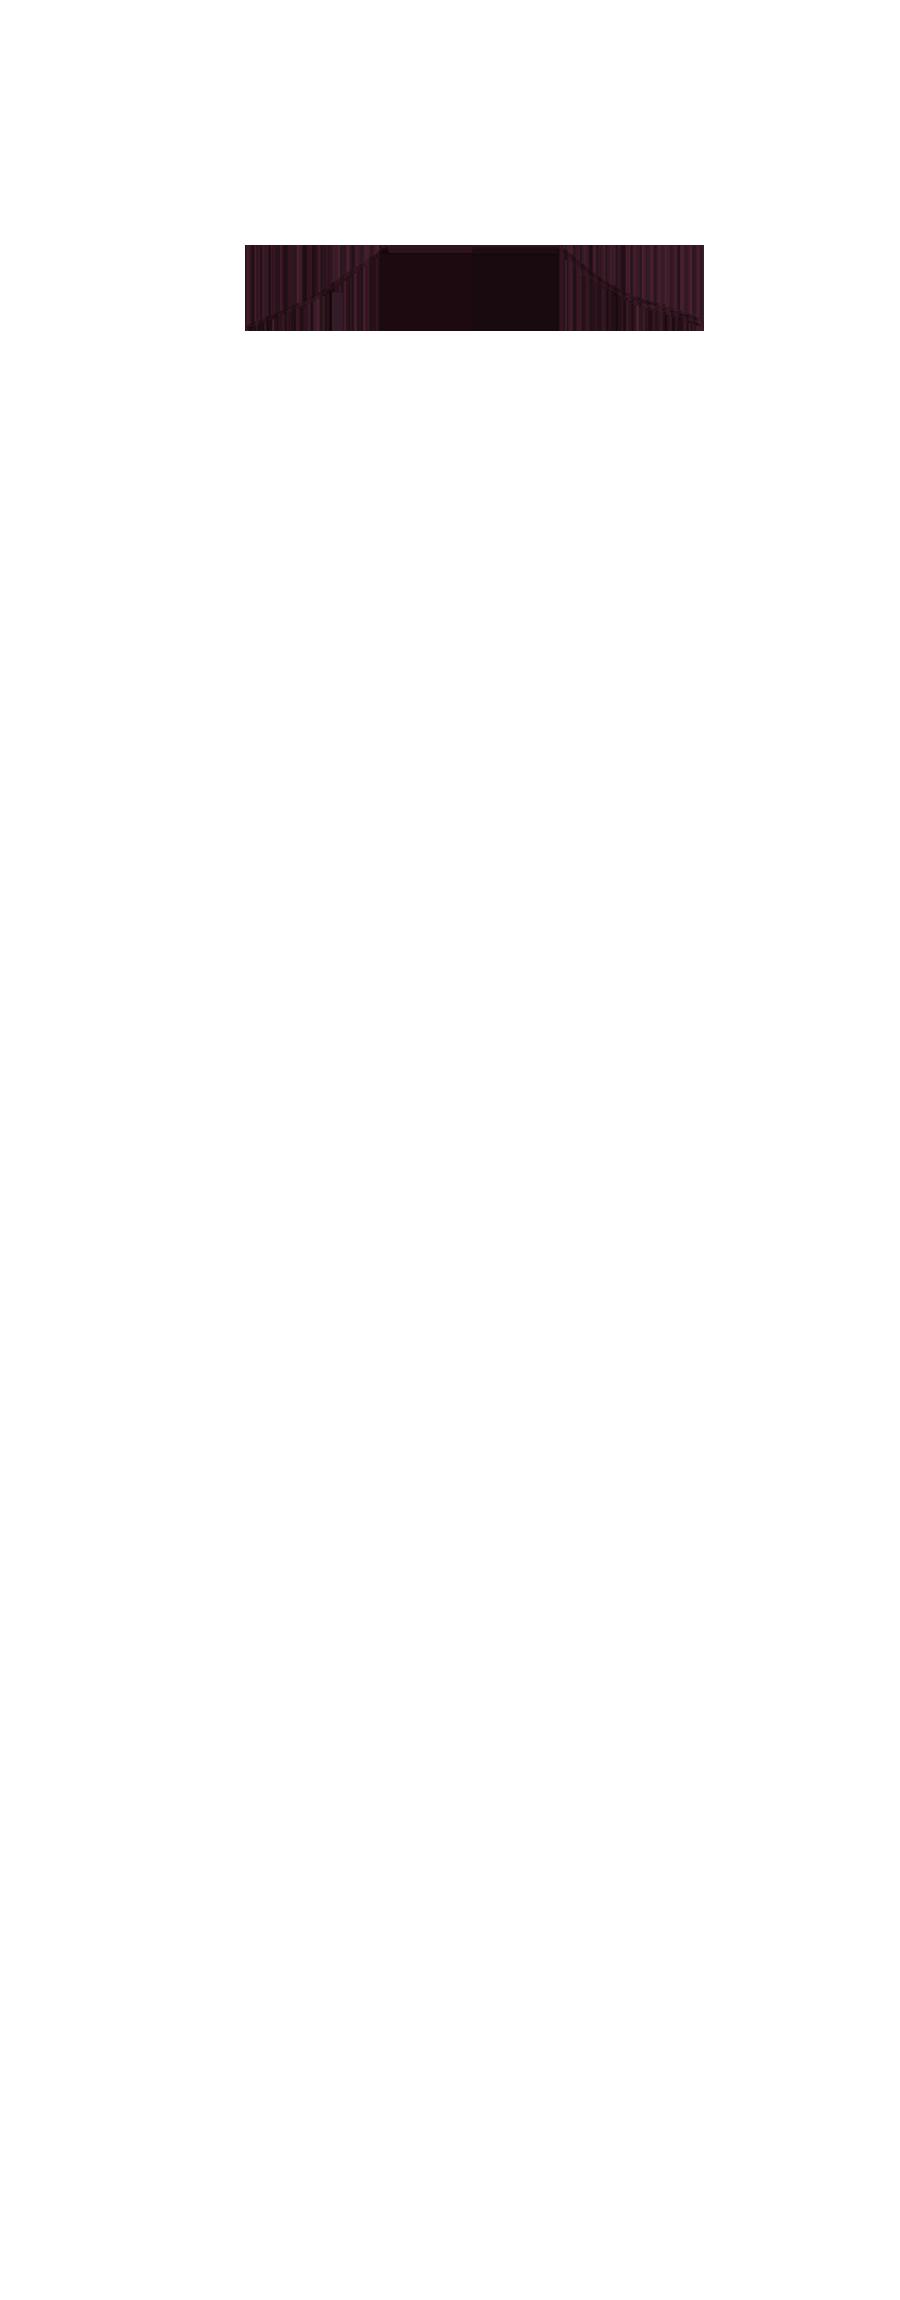 NEFL-3